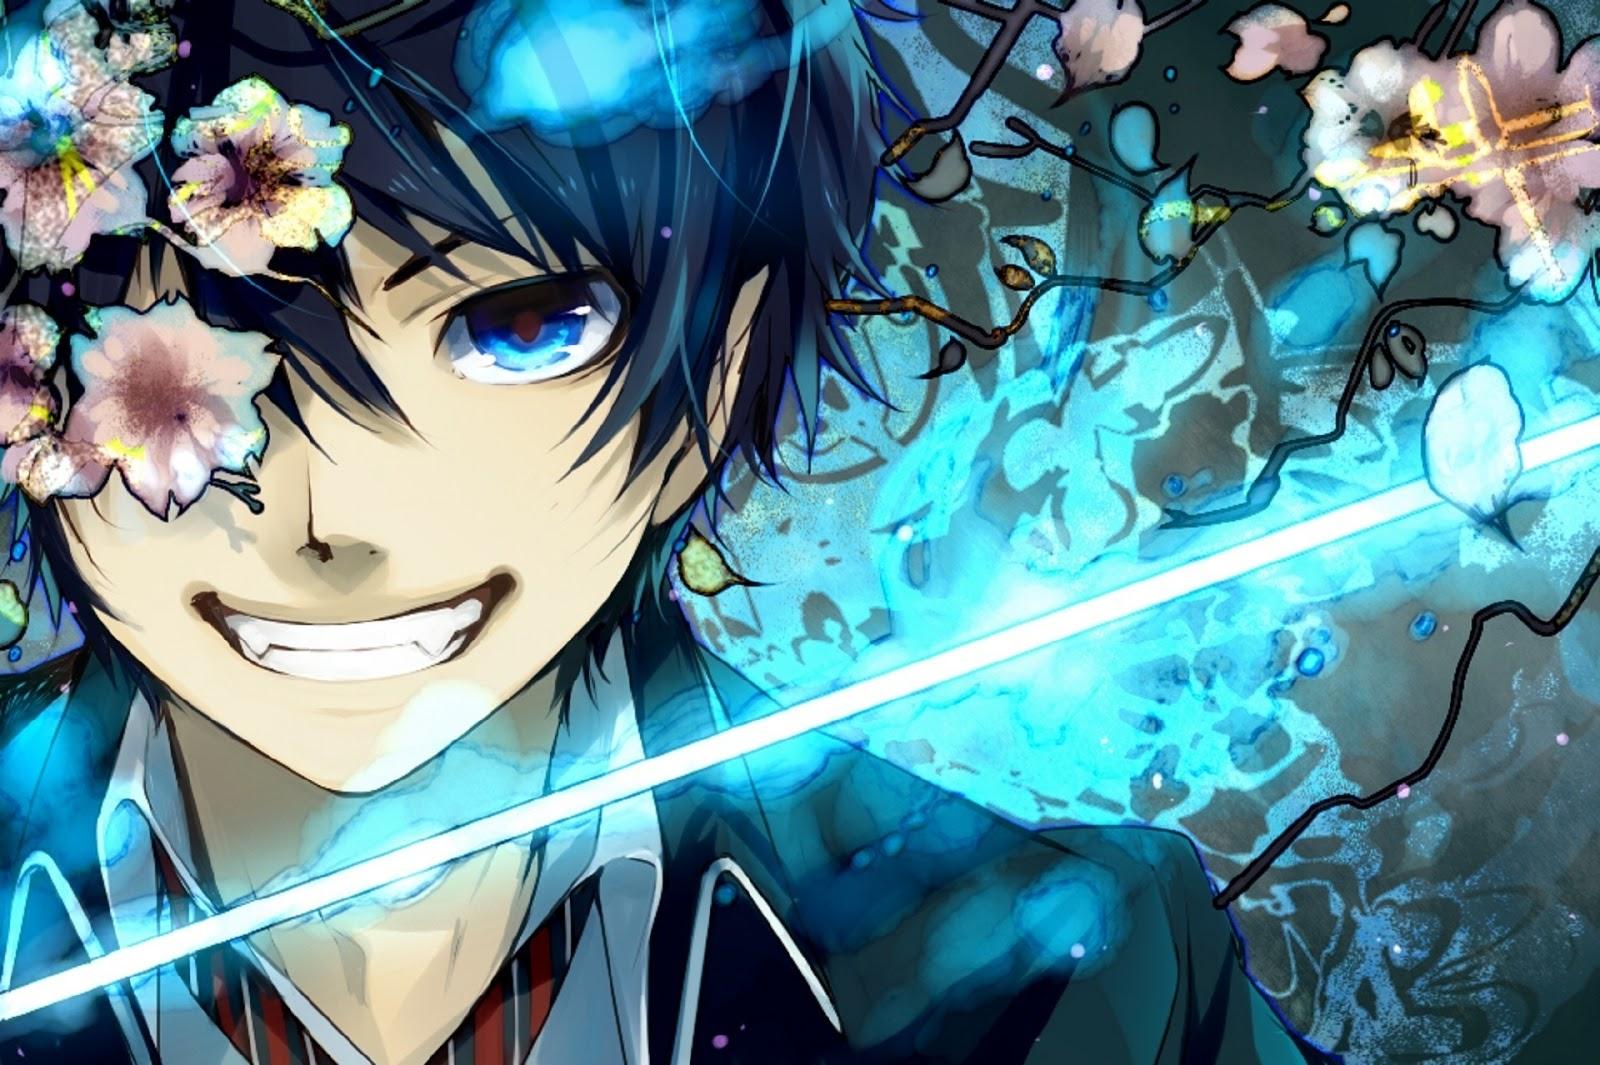 Anime time ao no exorcist - Rin wallpaper ...